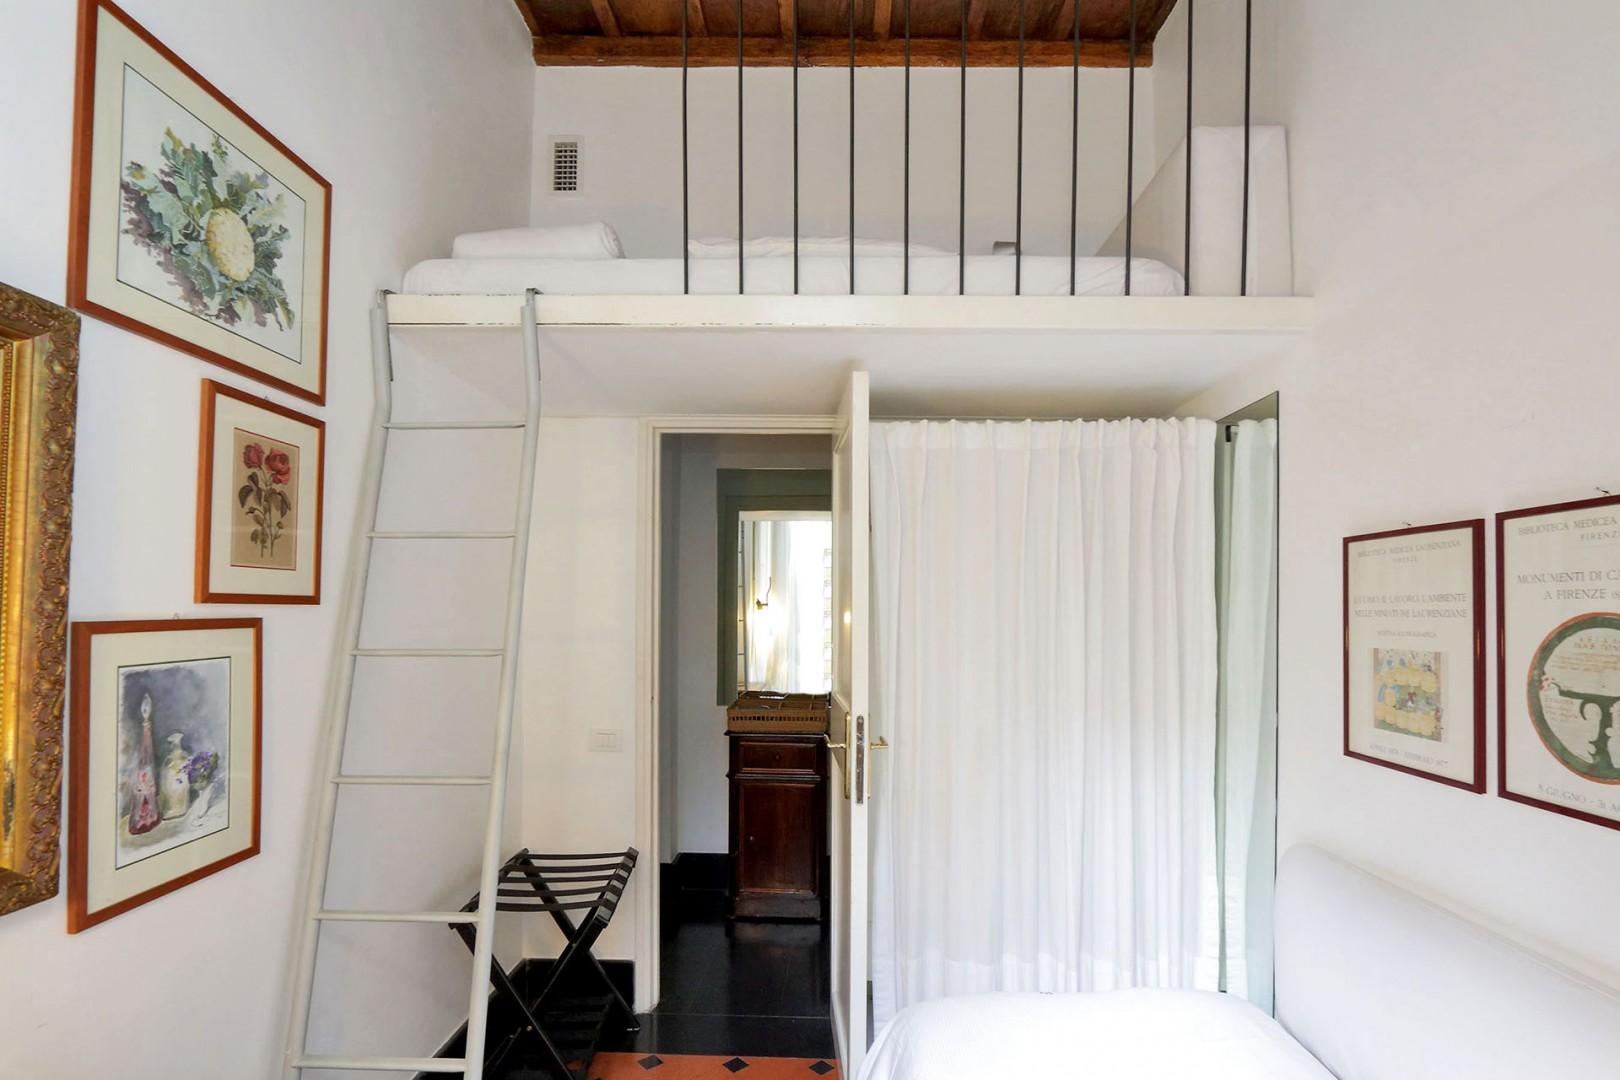 Bedroom 2 with sleeping loft.